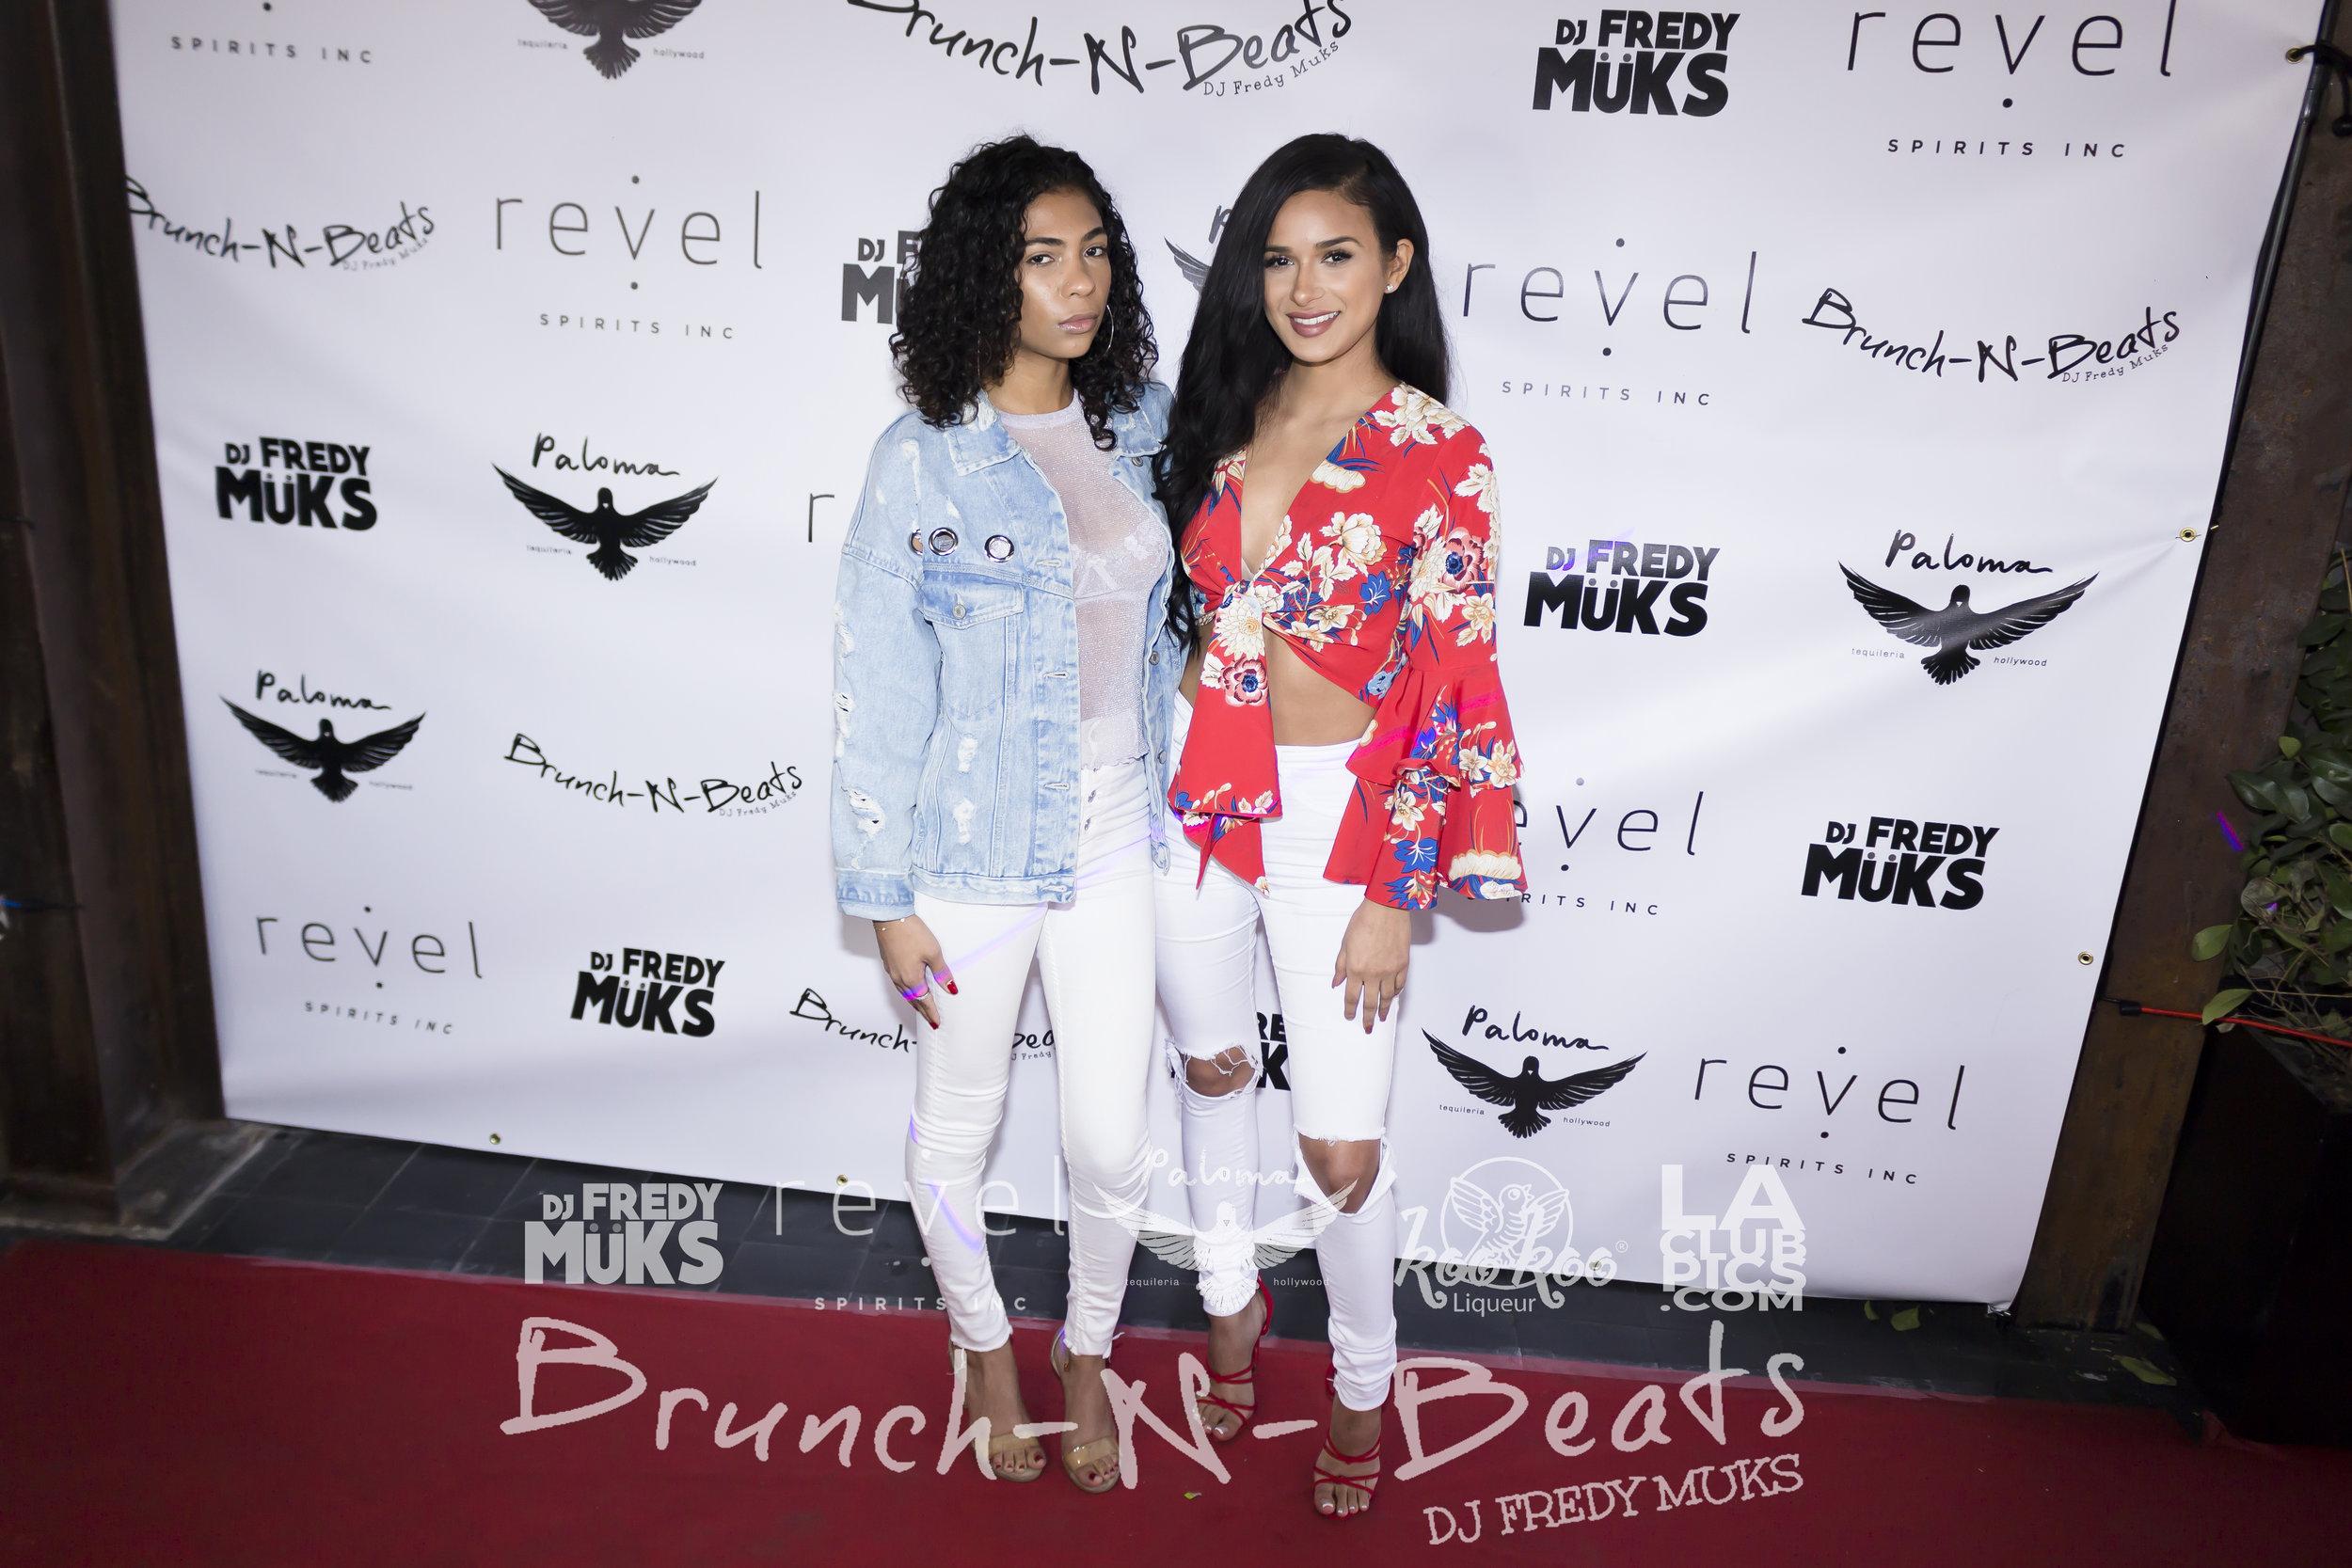 Brunch-N-Beats - Paloma Hollywood - 02-25-18_26.jpg